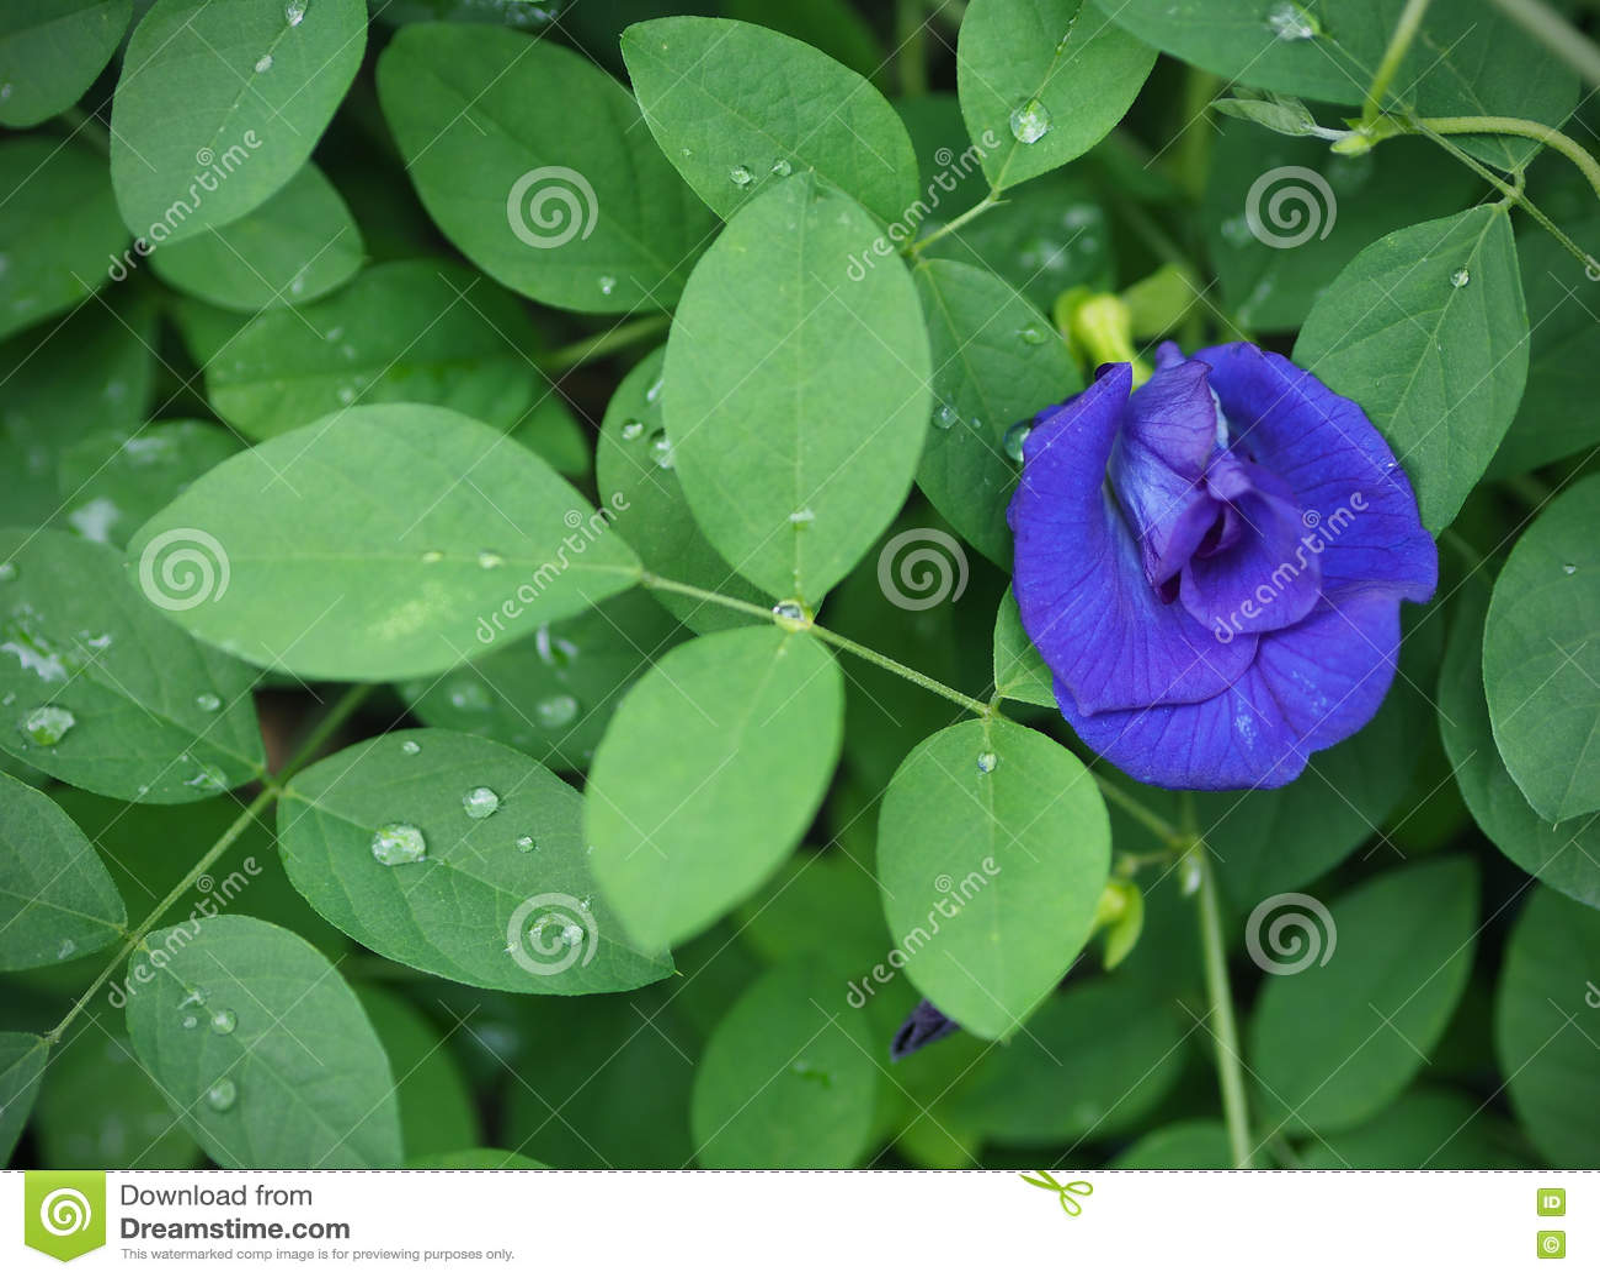 Schmetterlingserbse Blüht Blaue Farbe Mit Grünem Blatt Nach ...